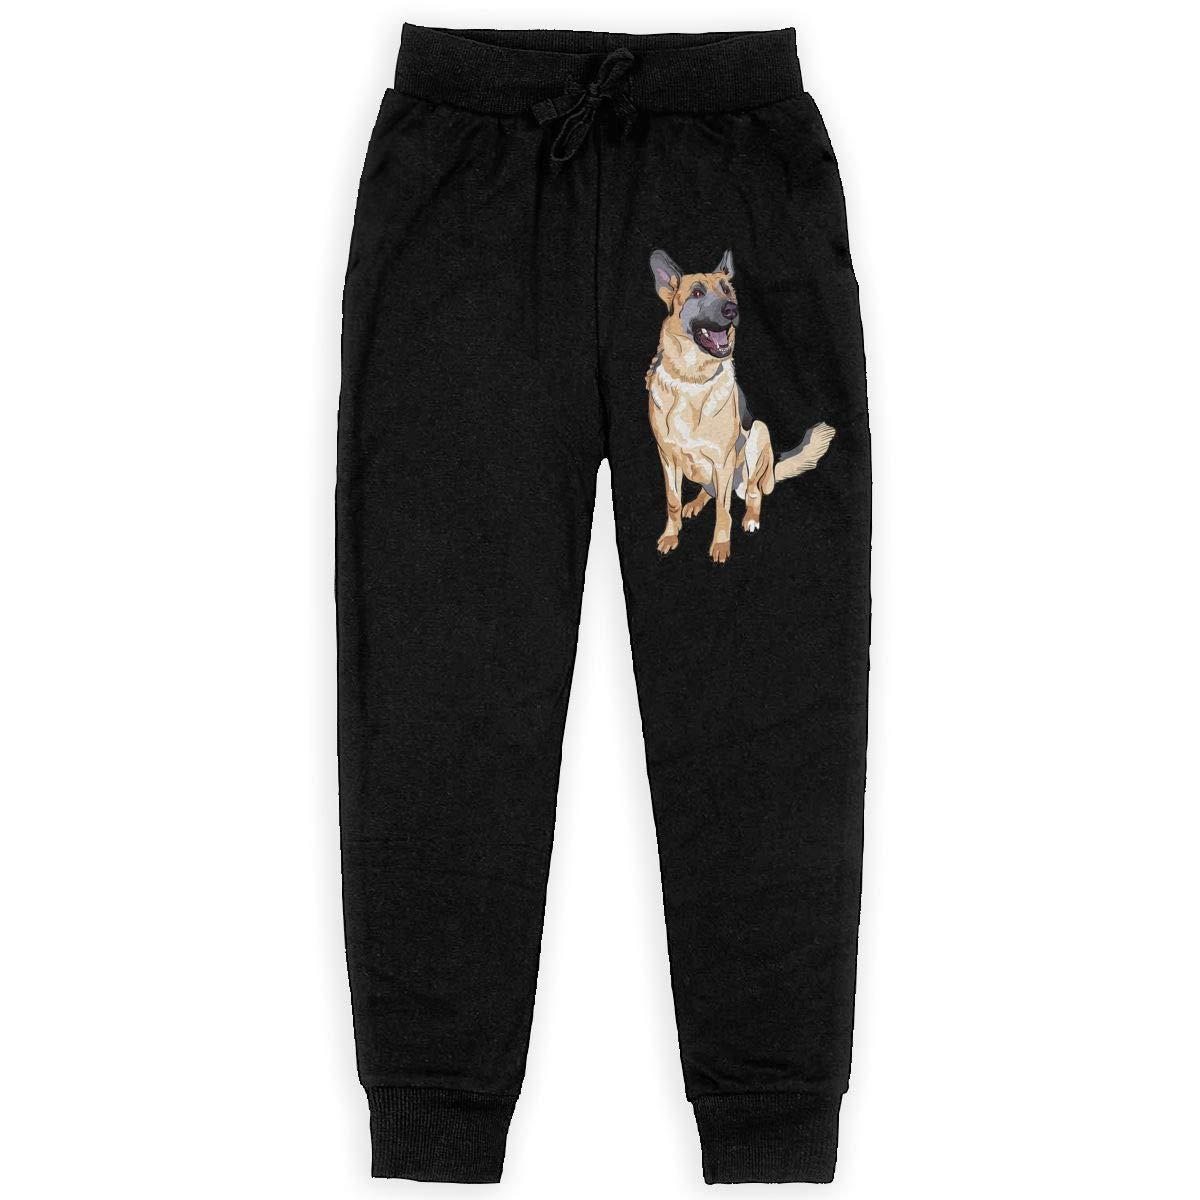 Qinf Boys Sweatpants German Shepherd Dog Joggers Sport Training Pants Trousers Cotton Sweatpants for Youth